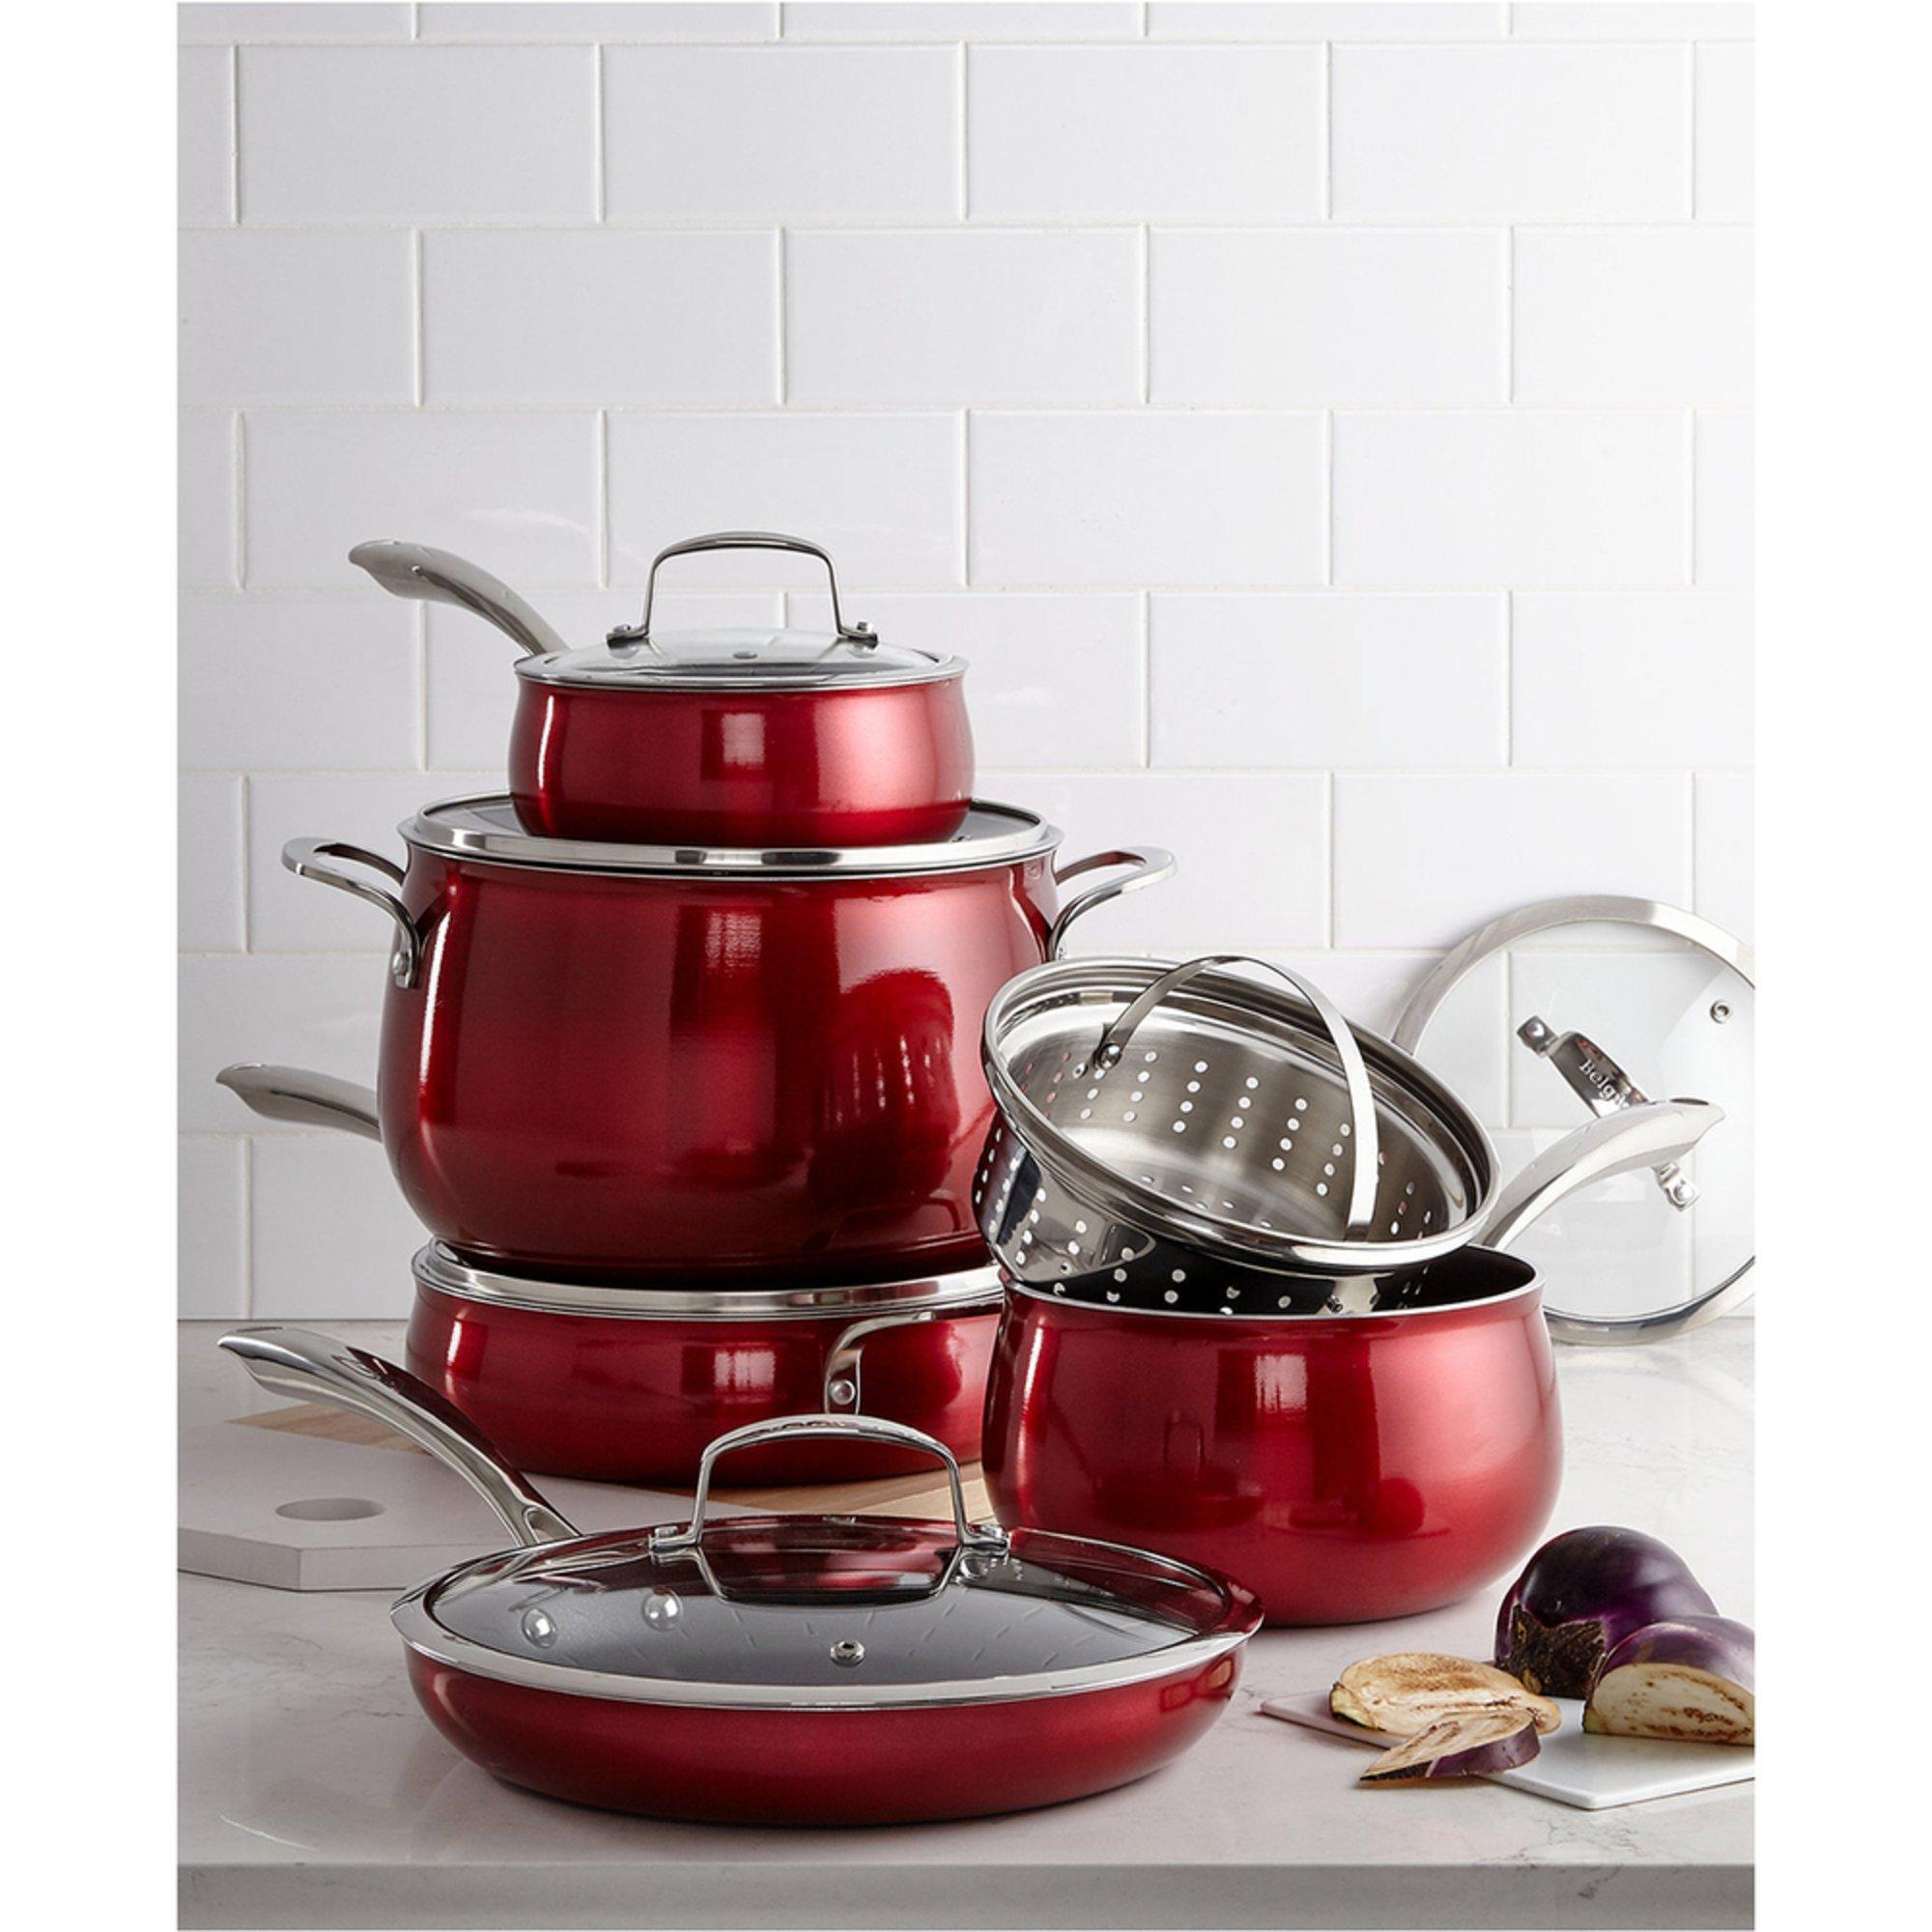 Belgique Aluminum 11-piece Cookware Set, Red | Cookware Sets